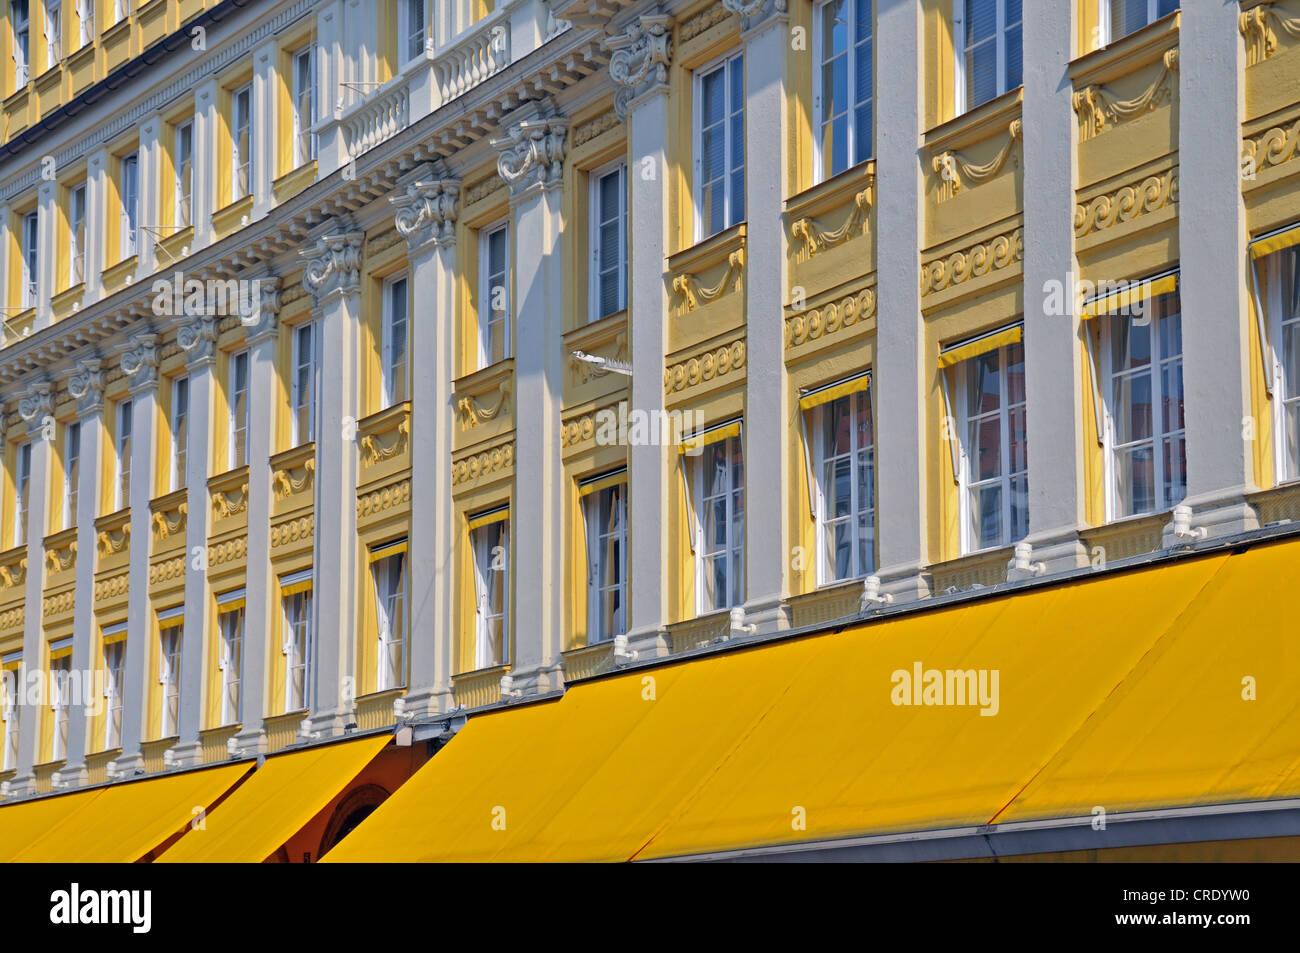 Feinkost Dallmayr delicatessen, Dienerstrasse, old town, Lehel quarter, Munich, Bavaria, Germany, Europe - Stock Image